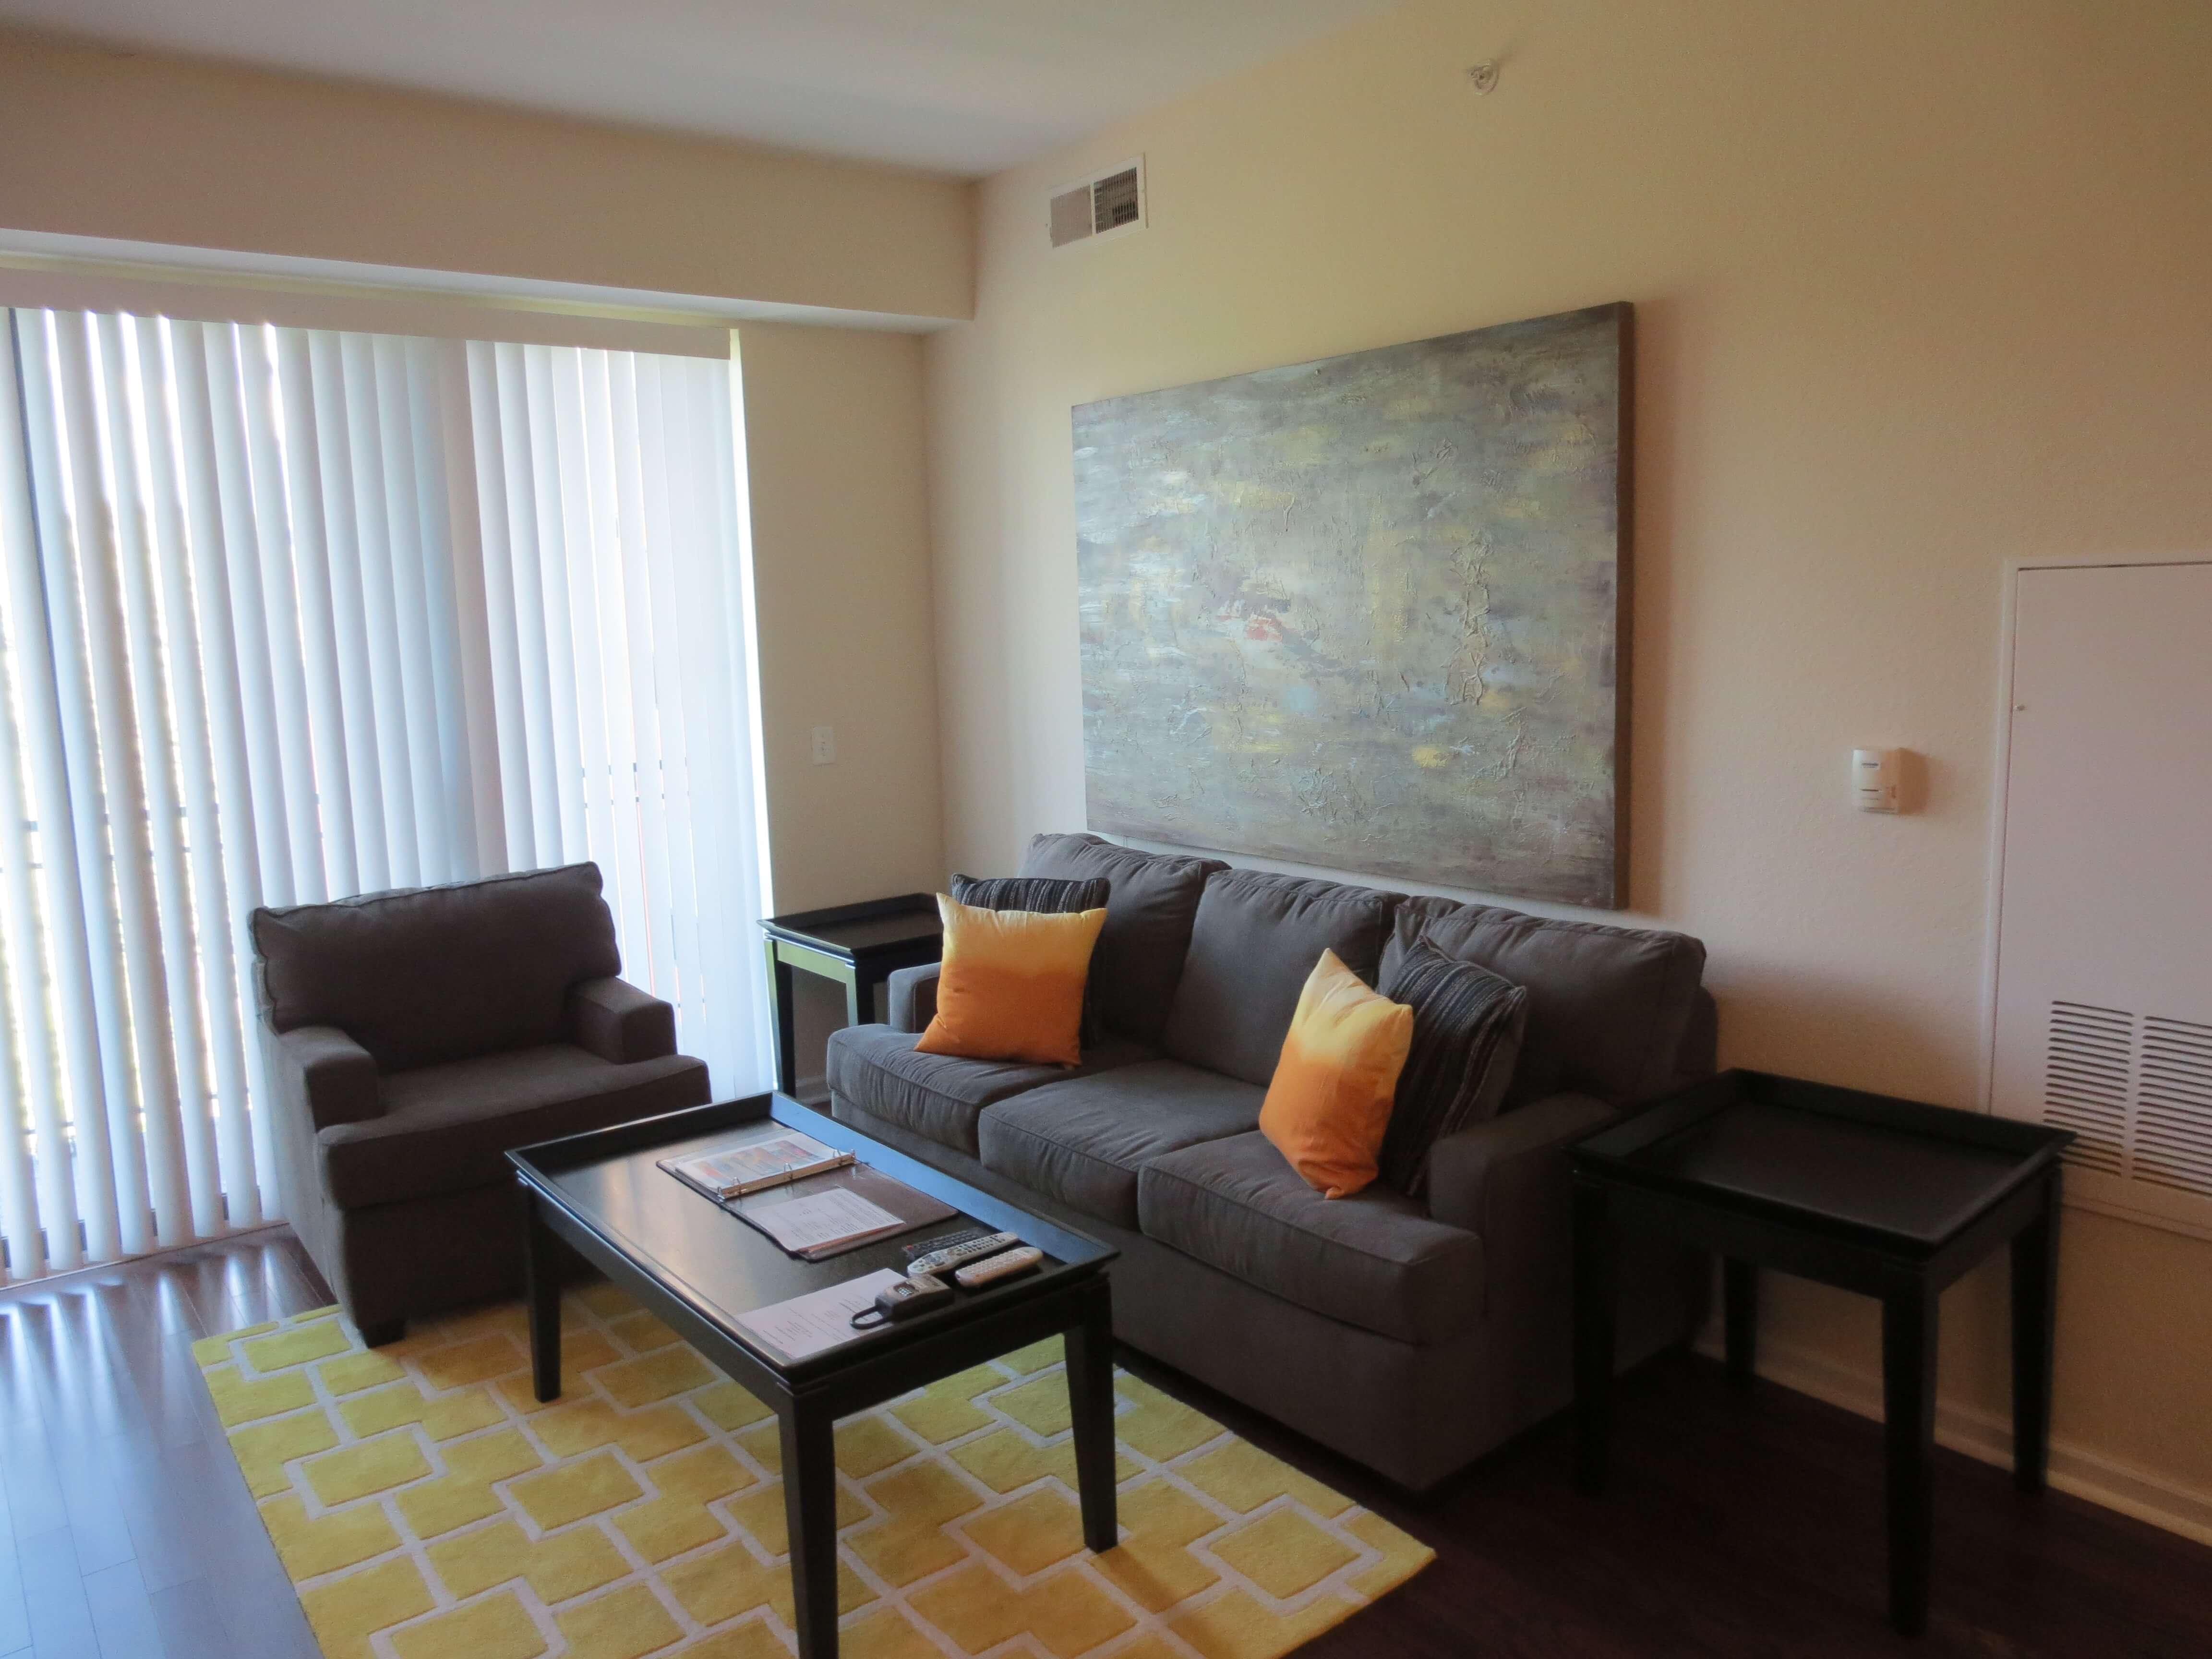 norwalk furnished 1 bedroom apartment for rent 5160 per